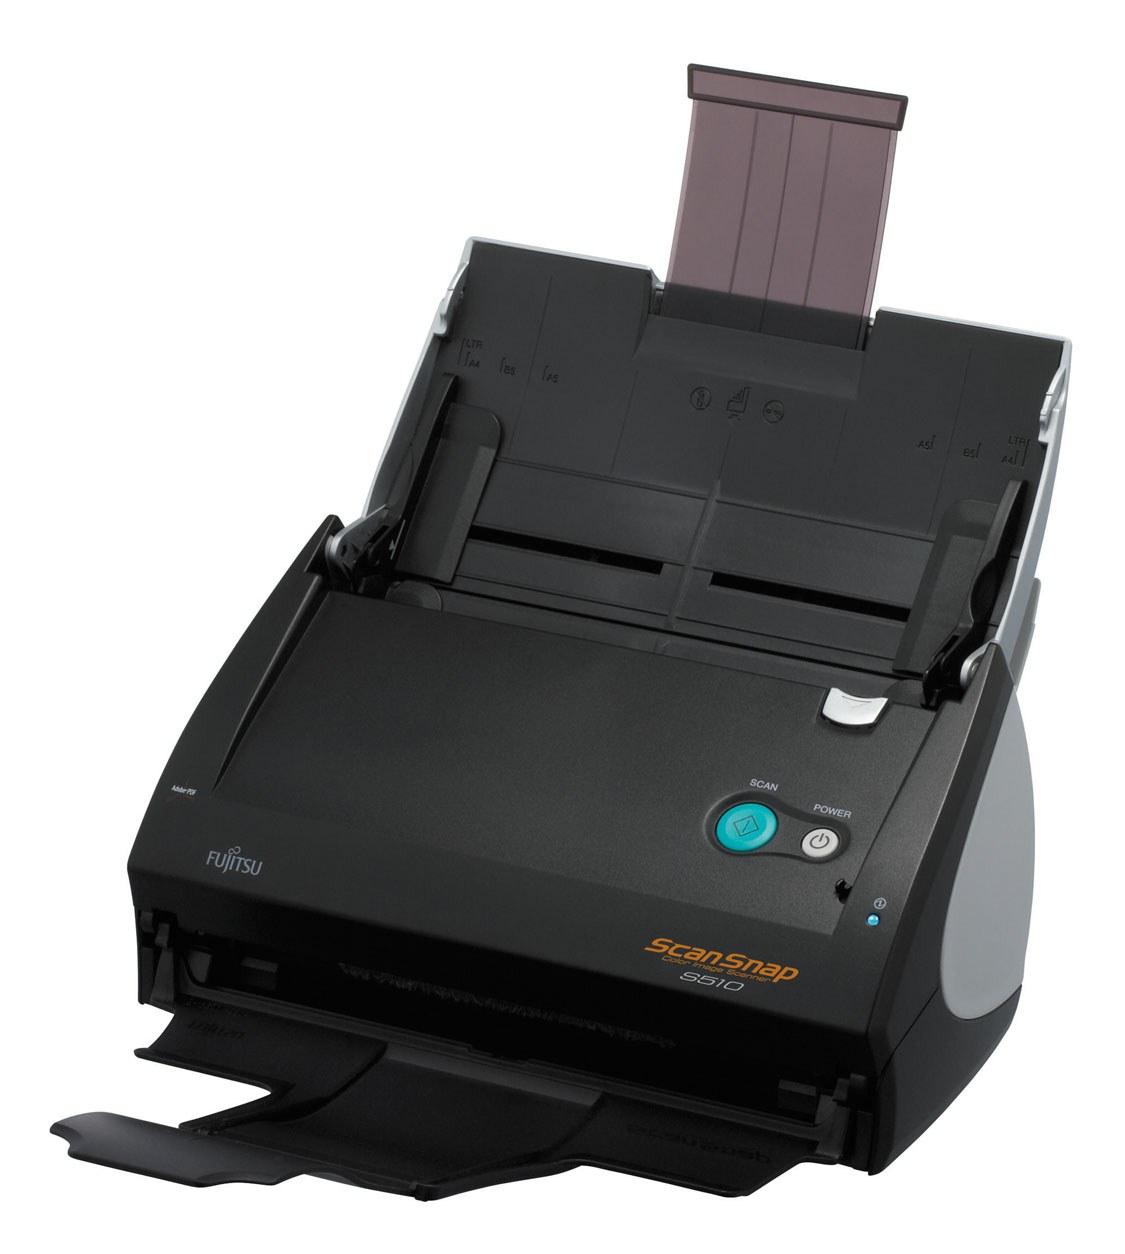 Fujitsu Scansnap S510 Scansnap S510 Supplies And Scansnap